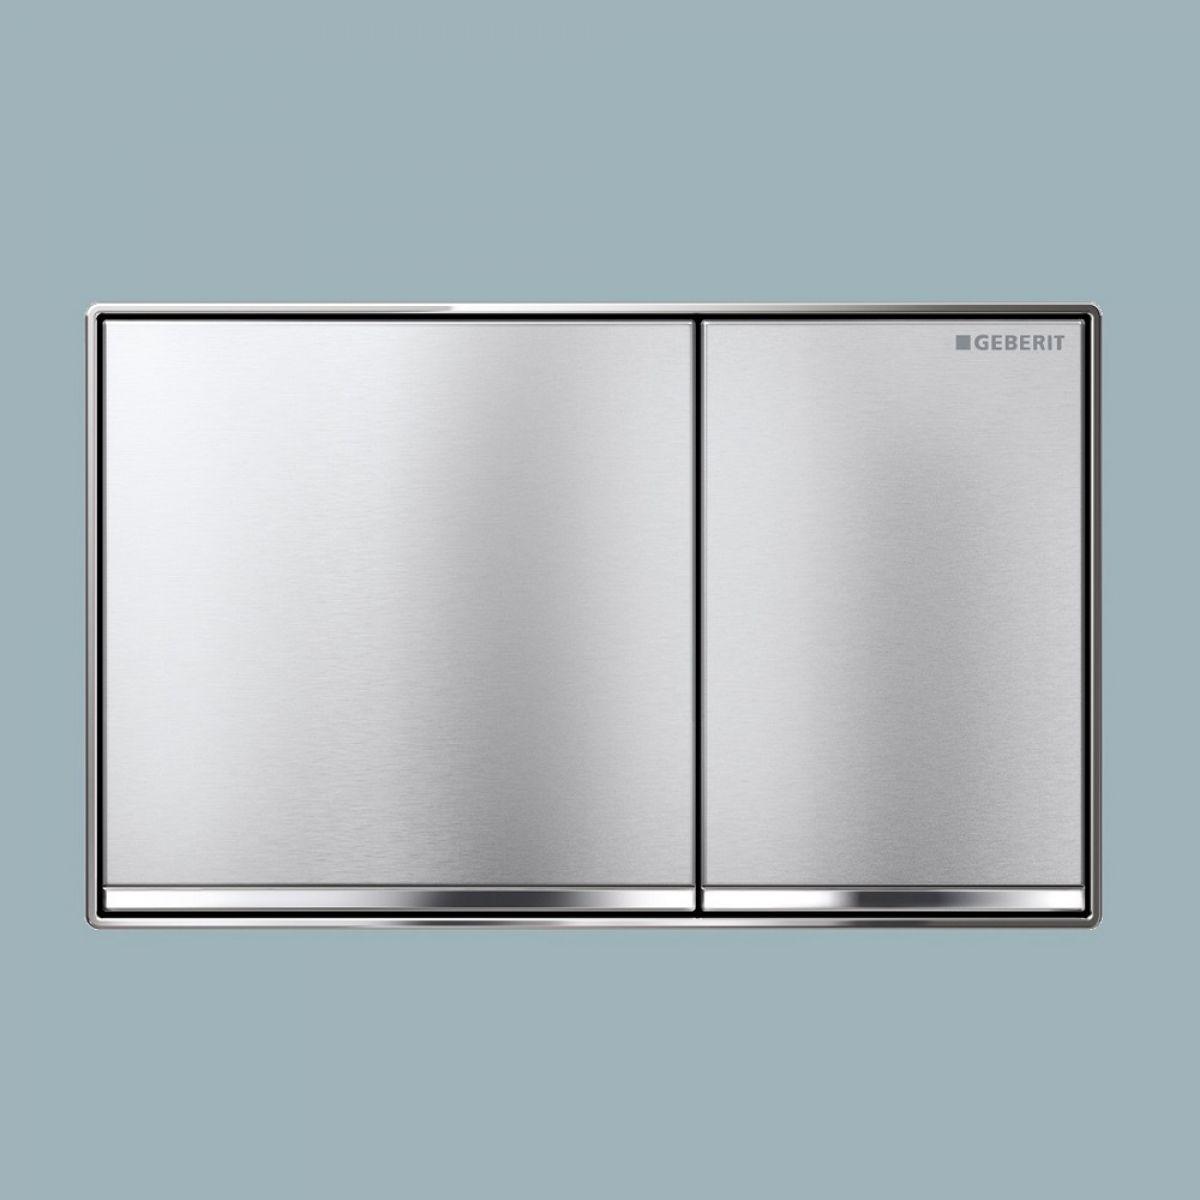 Geberit Omega60 Dual Flush Plate